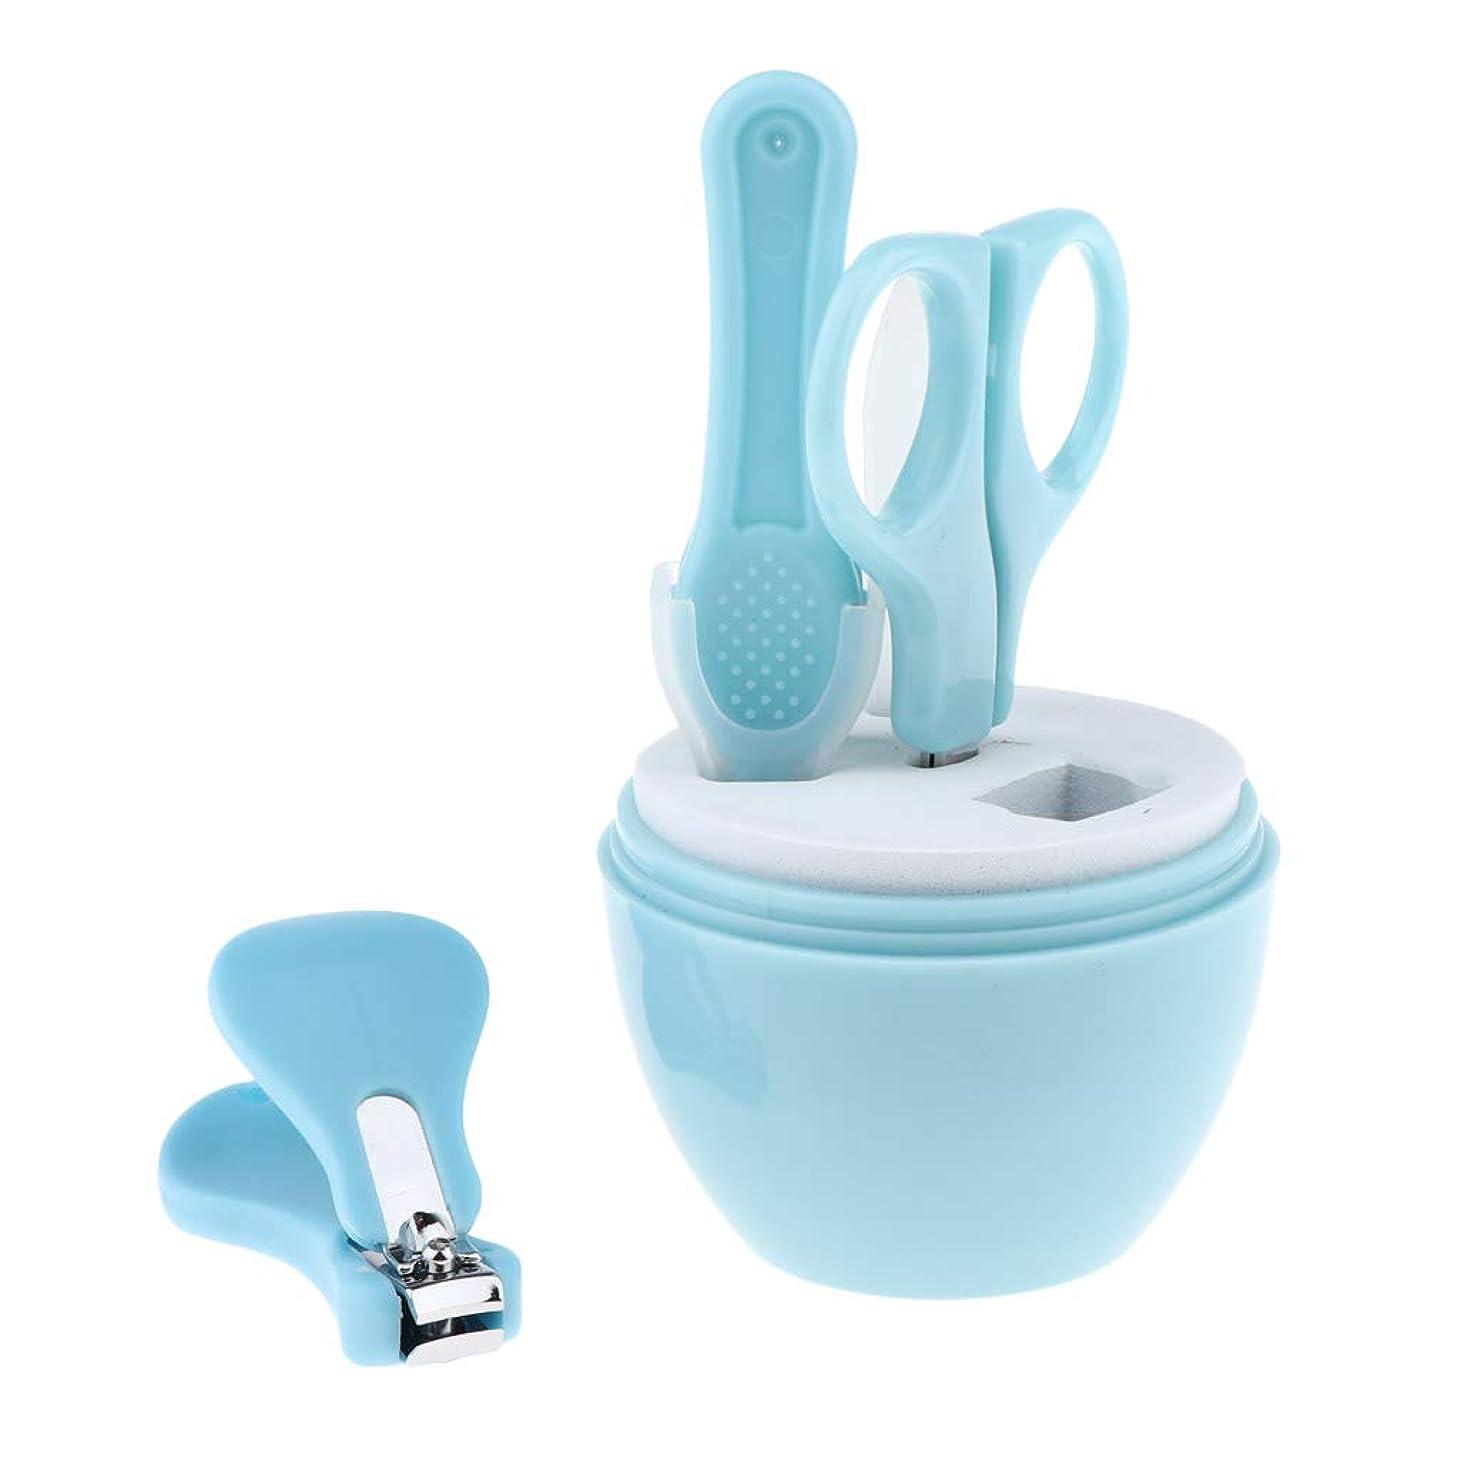 Perfeclan 2色選択 ネイルシザー ネイルクリッパー ネイルファイルピン 爪切り 子供用ネイルケアセット - ブルー